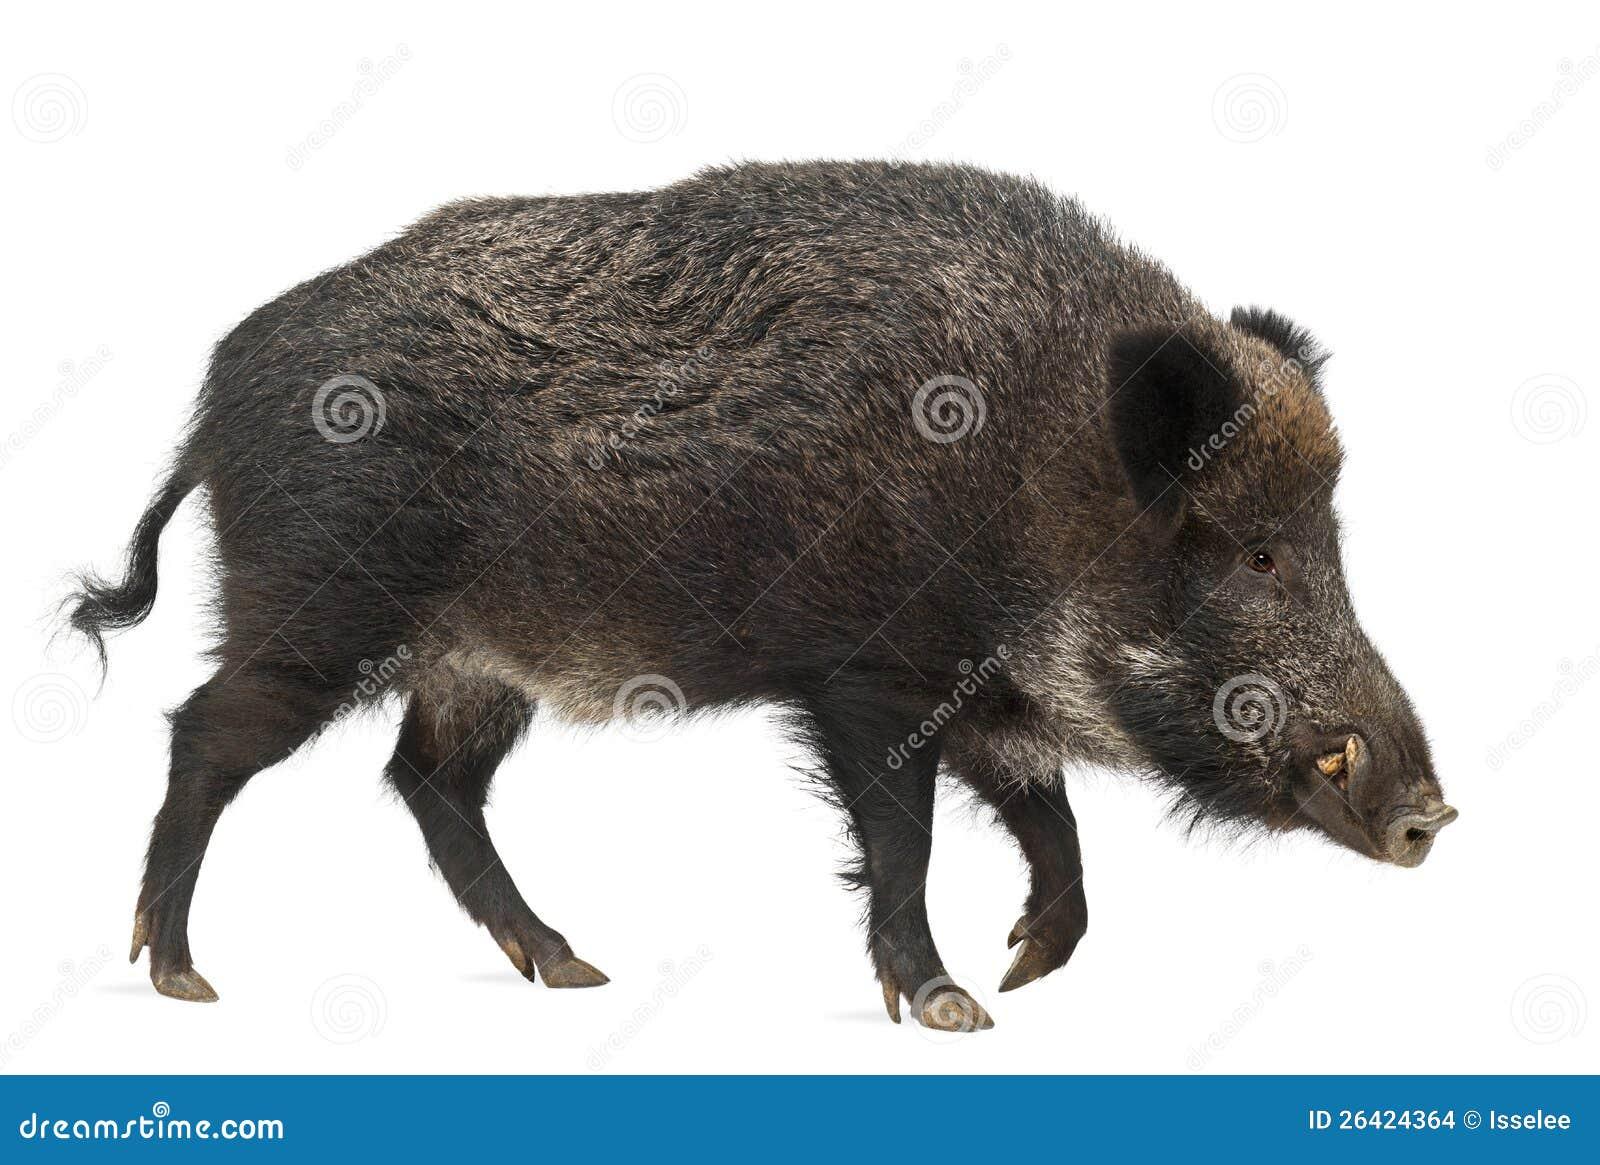 wild boar  also wild pig  sus scrofa stock images image polar bear clip art free polar bear clipart easy to draw